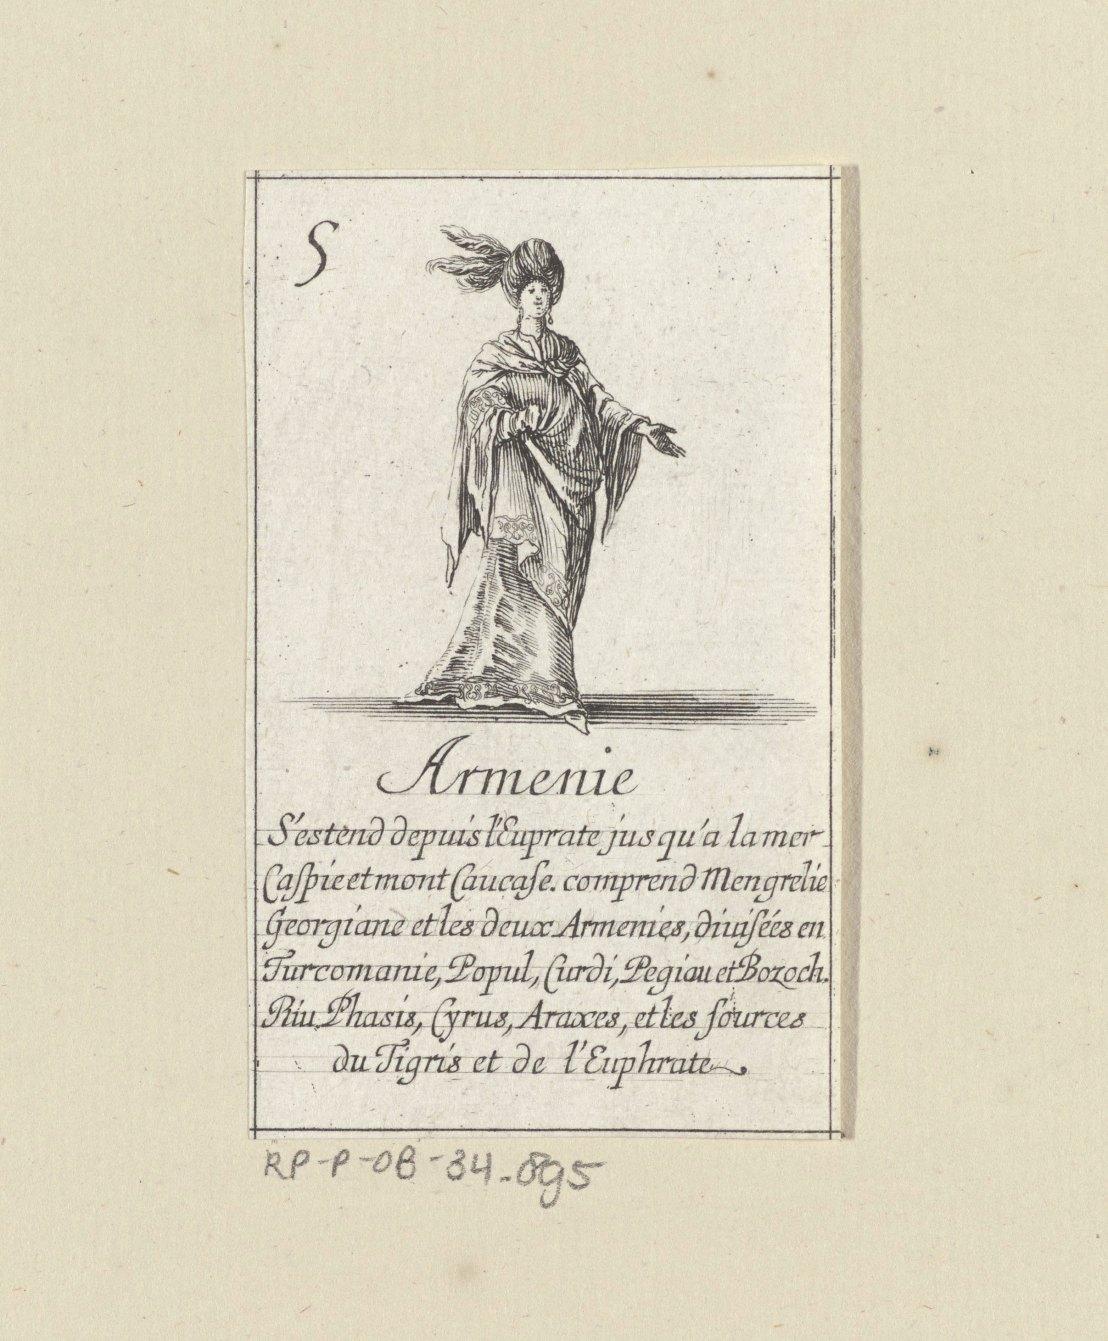 Armenian lady by Stefano della Bella, 1620 - 1664